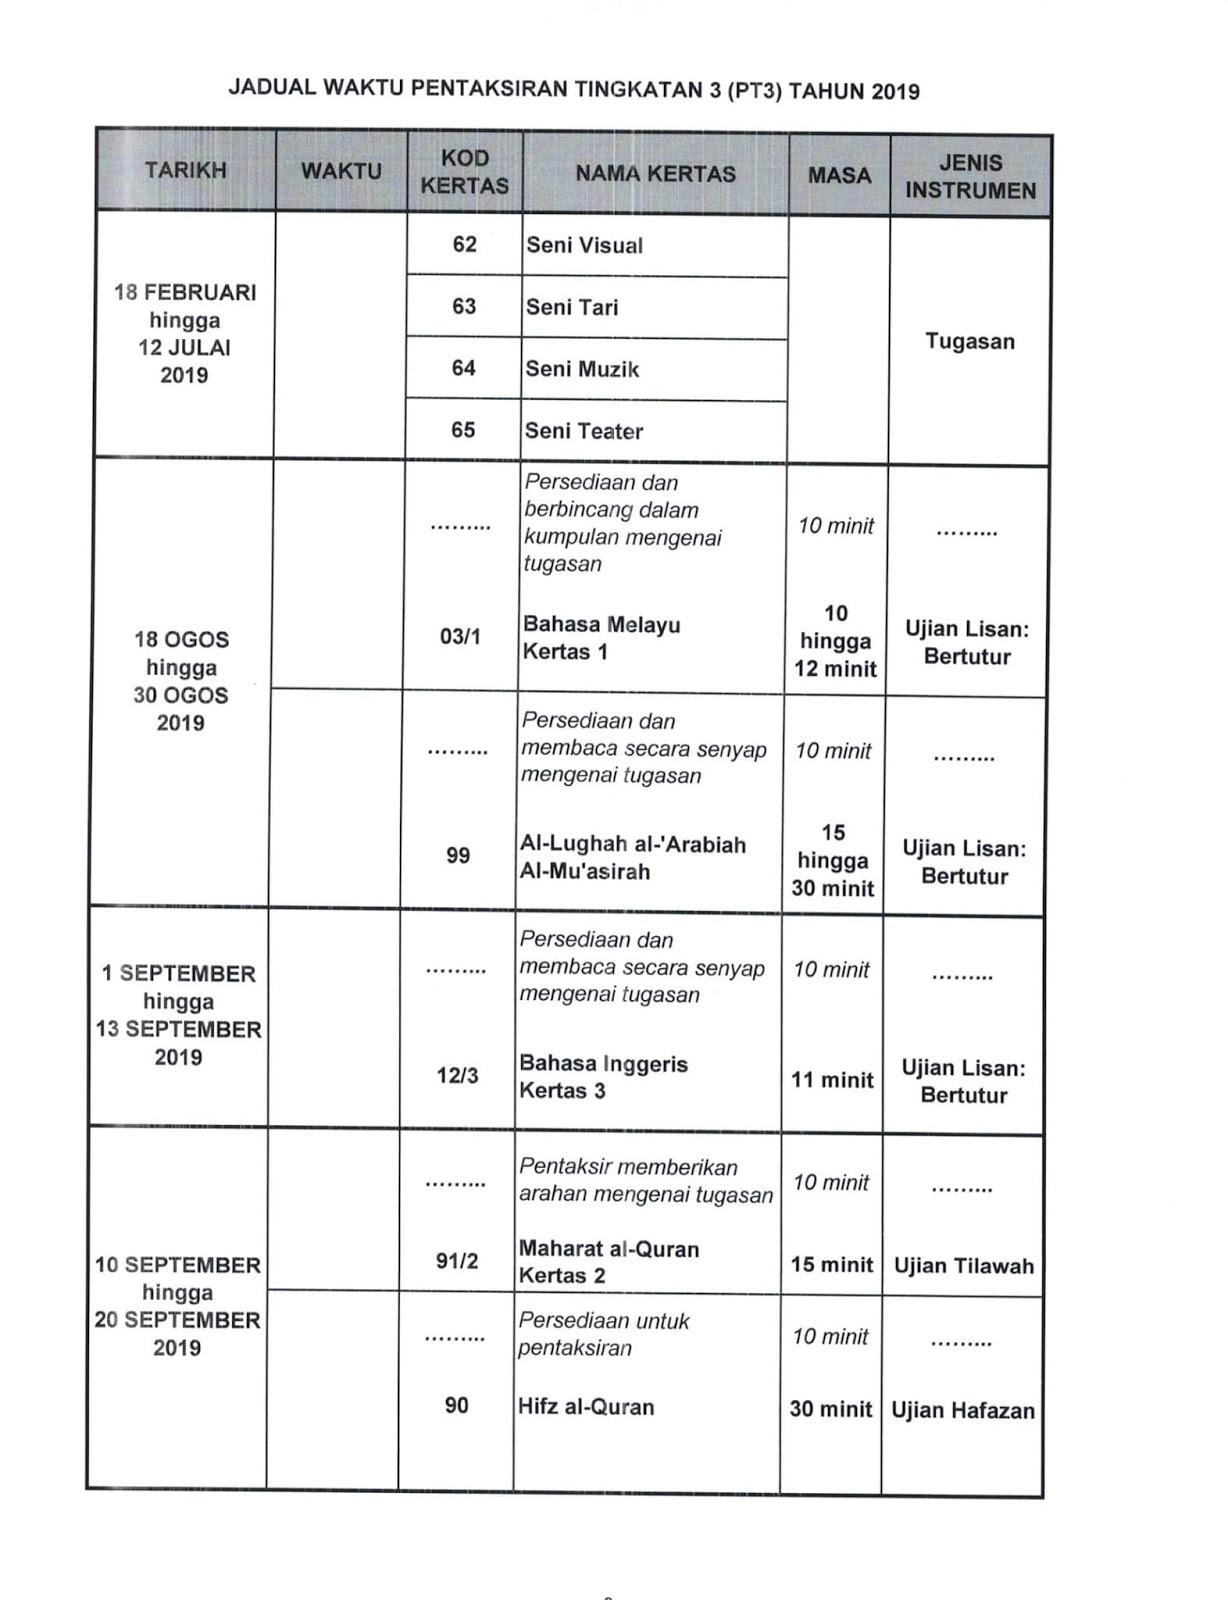 Pt3 2019 Timetable Parenting Times